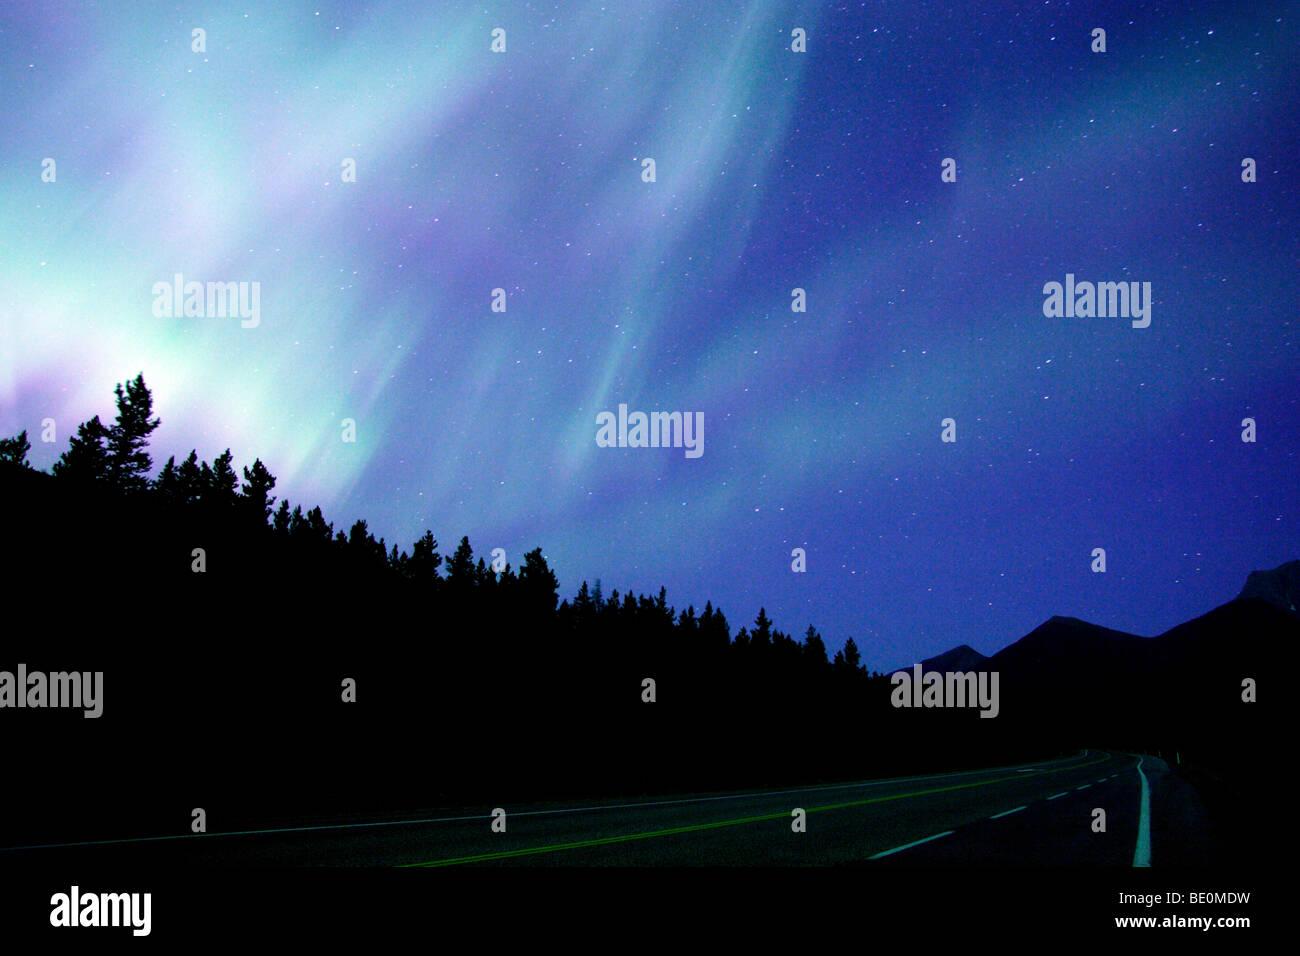 Northern Lights above highway at dusk - Stock Image